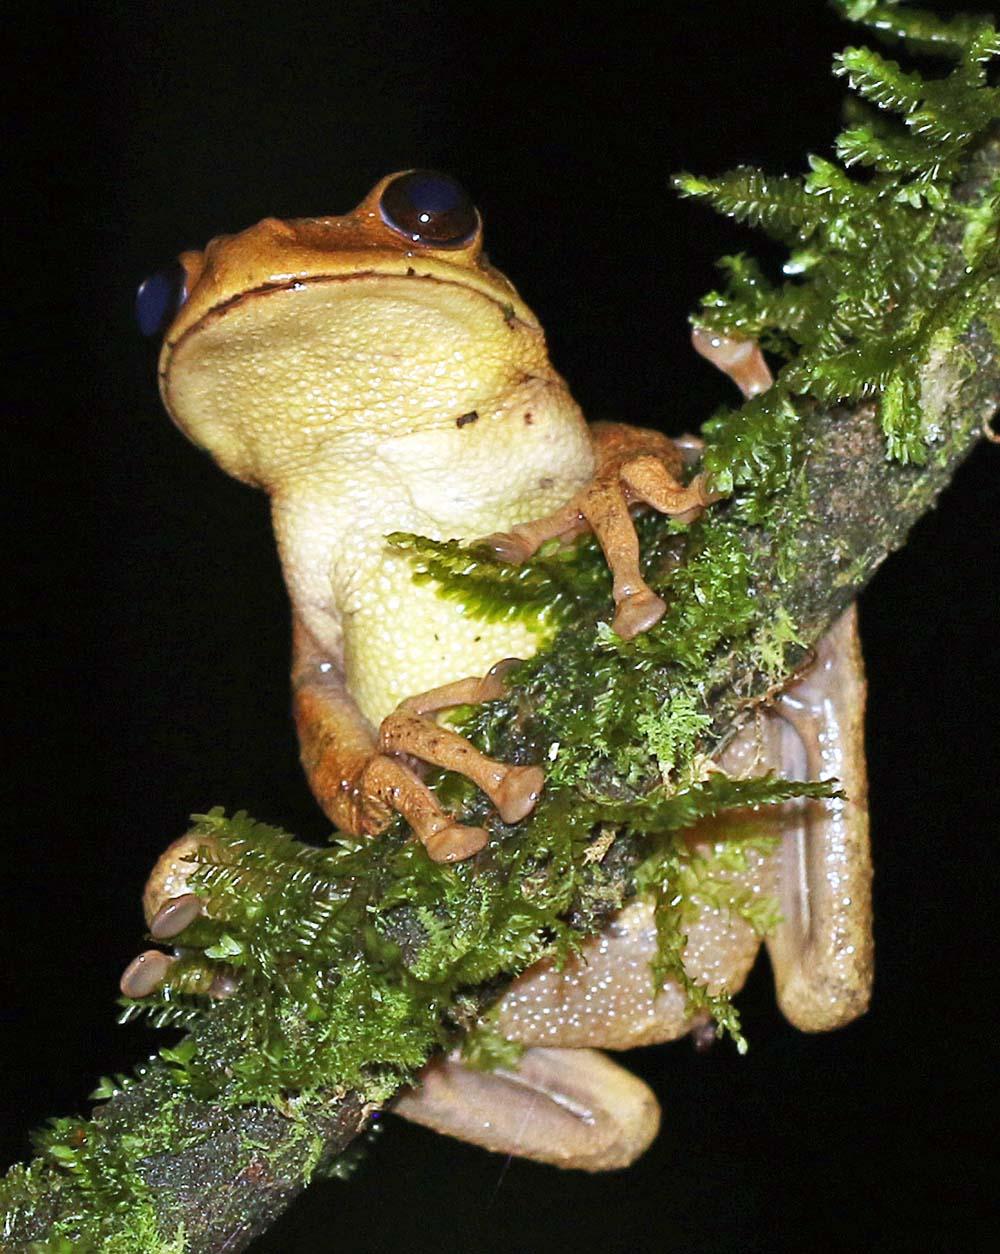 Frog, Ecuador (image by Damon Ramsey)